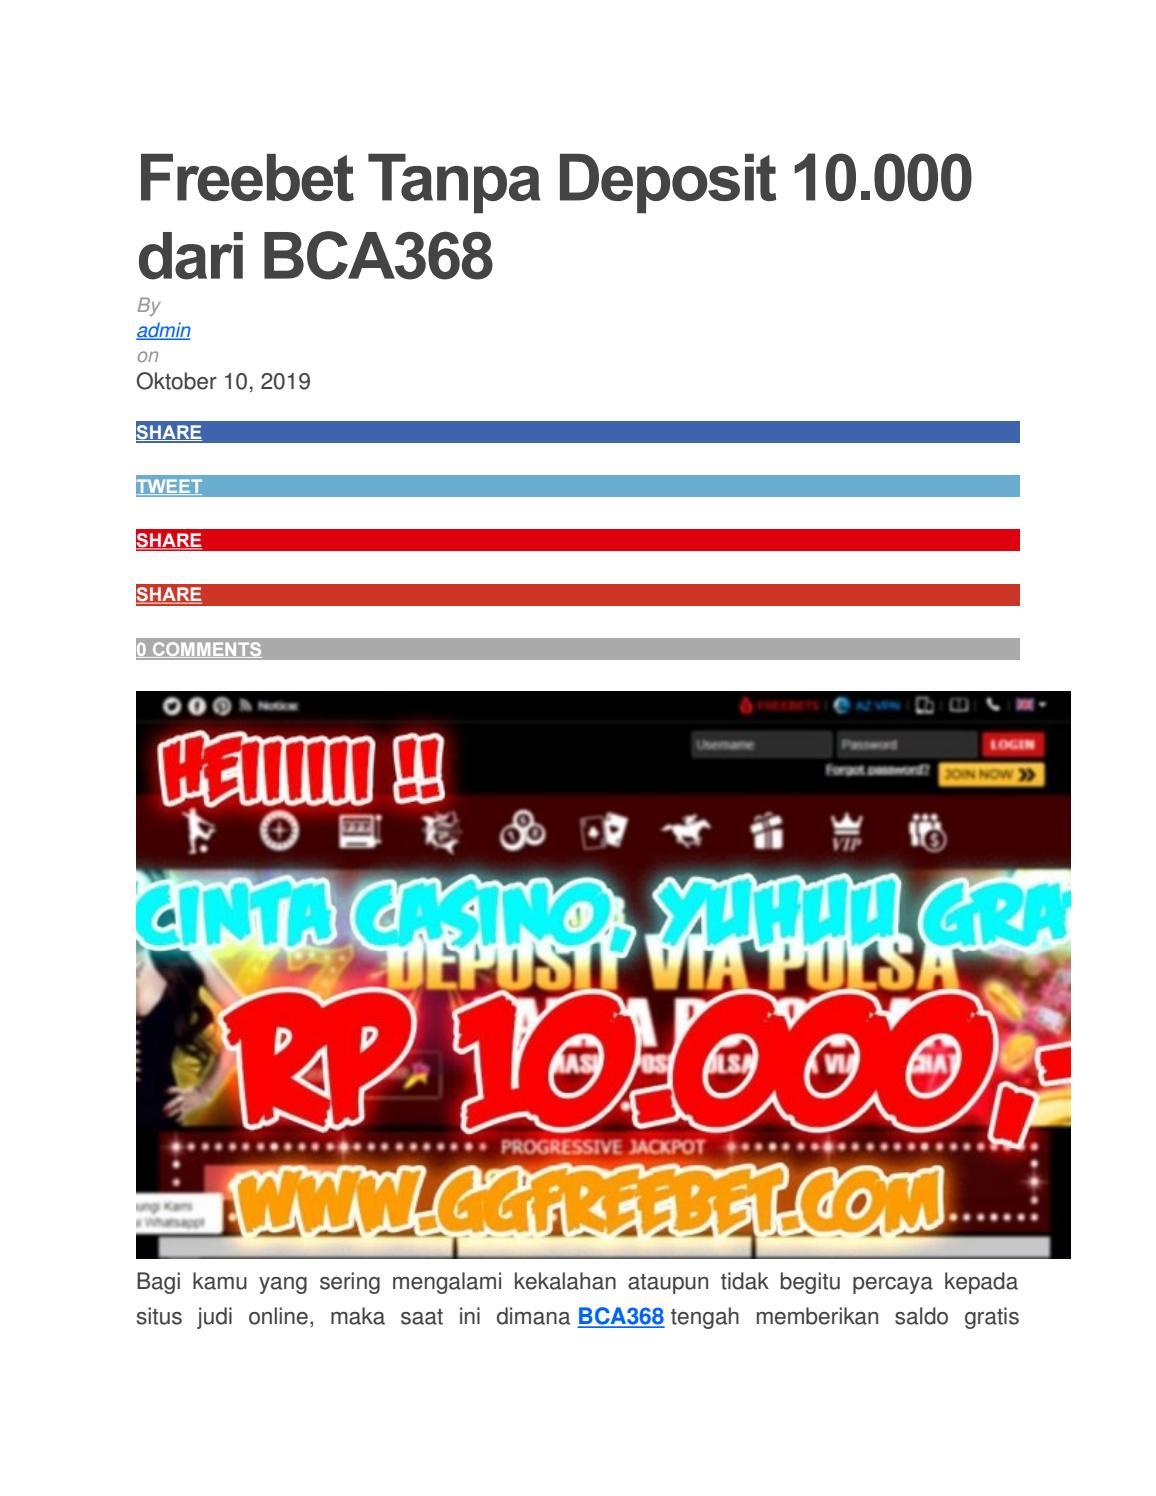 Freebet Tanpa Deposit 10 000 Dari Bca368 By Freebet Terbaru Issuu